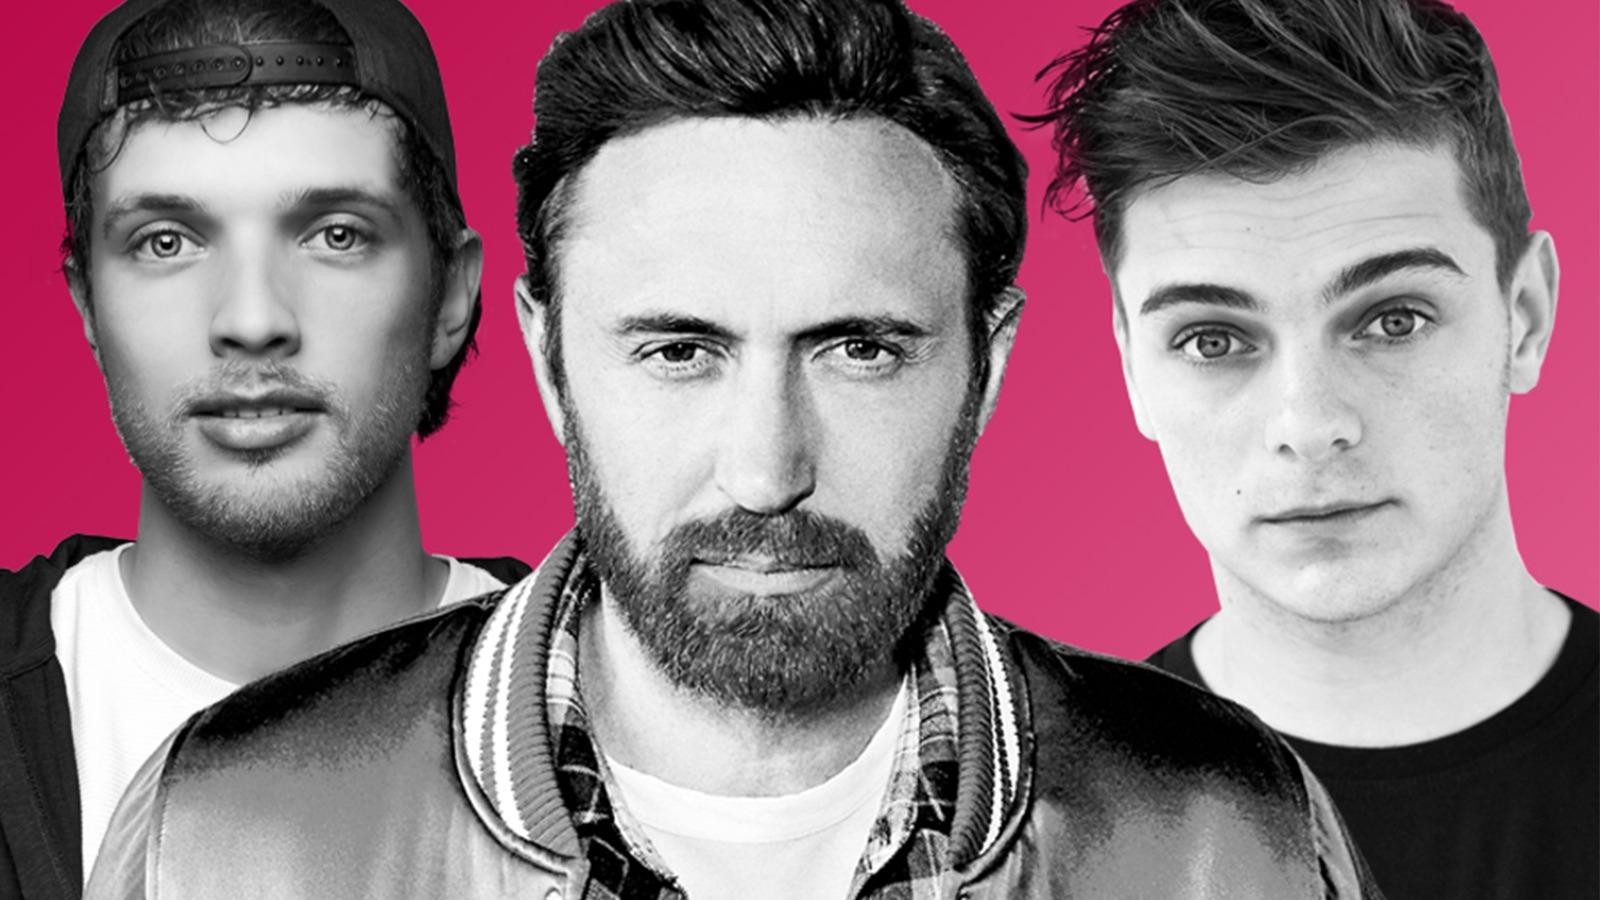 Maxima 51 Chart Nº1 David Guetta, Martin Garrix and Brooks